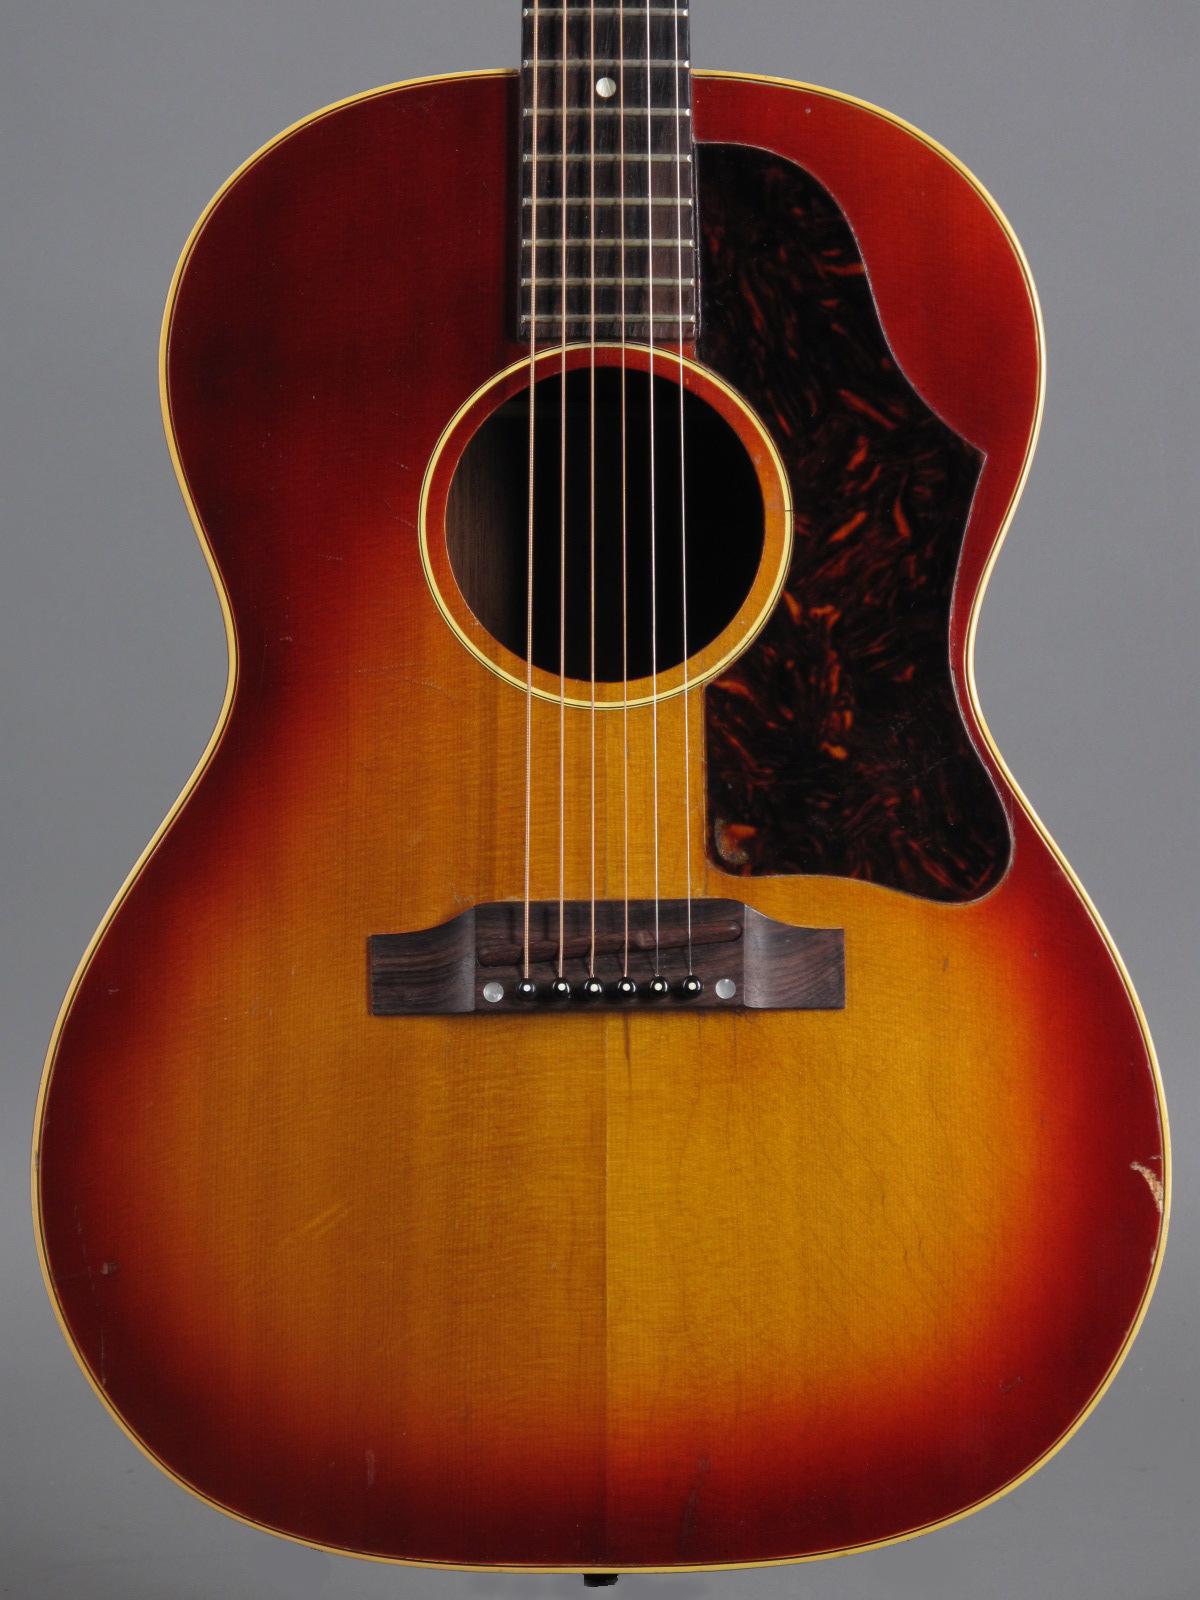 1963 Gibson B-25 - Sunburst